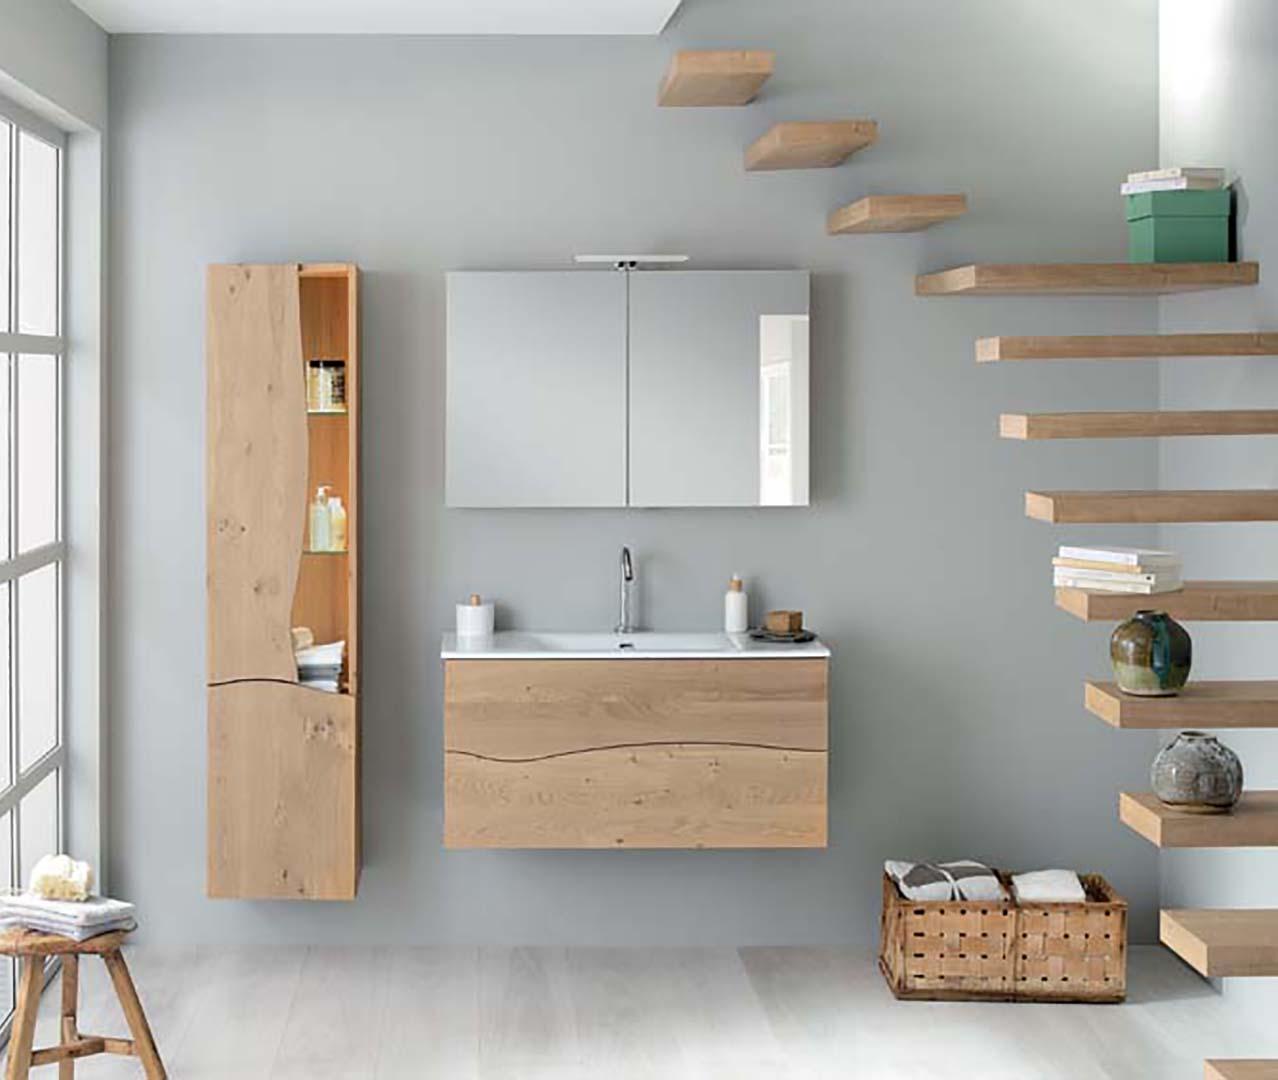 sanijura meuble de salle de bain fabrication fran aise. Black Bedroom Furniture Sets. Home Design Ideas